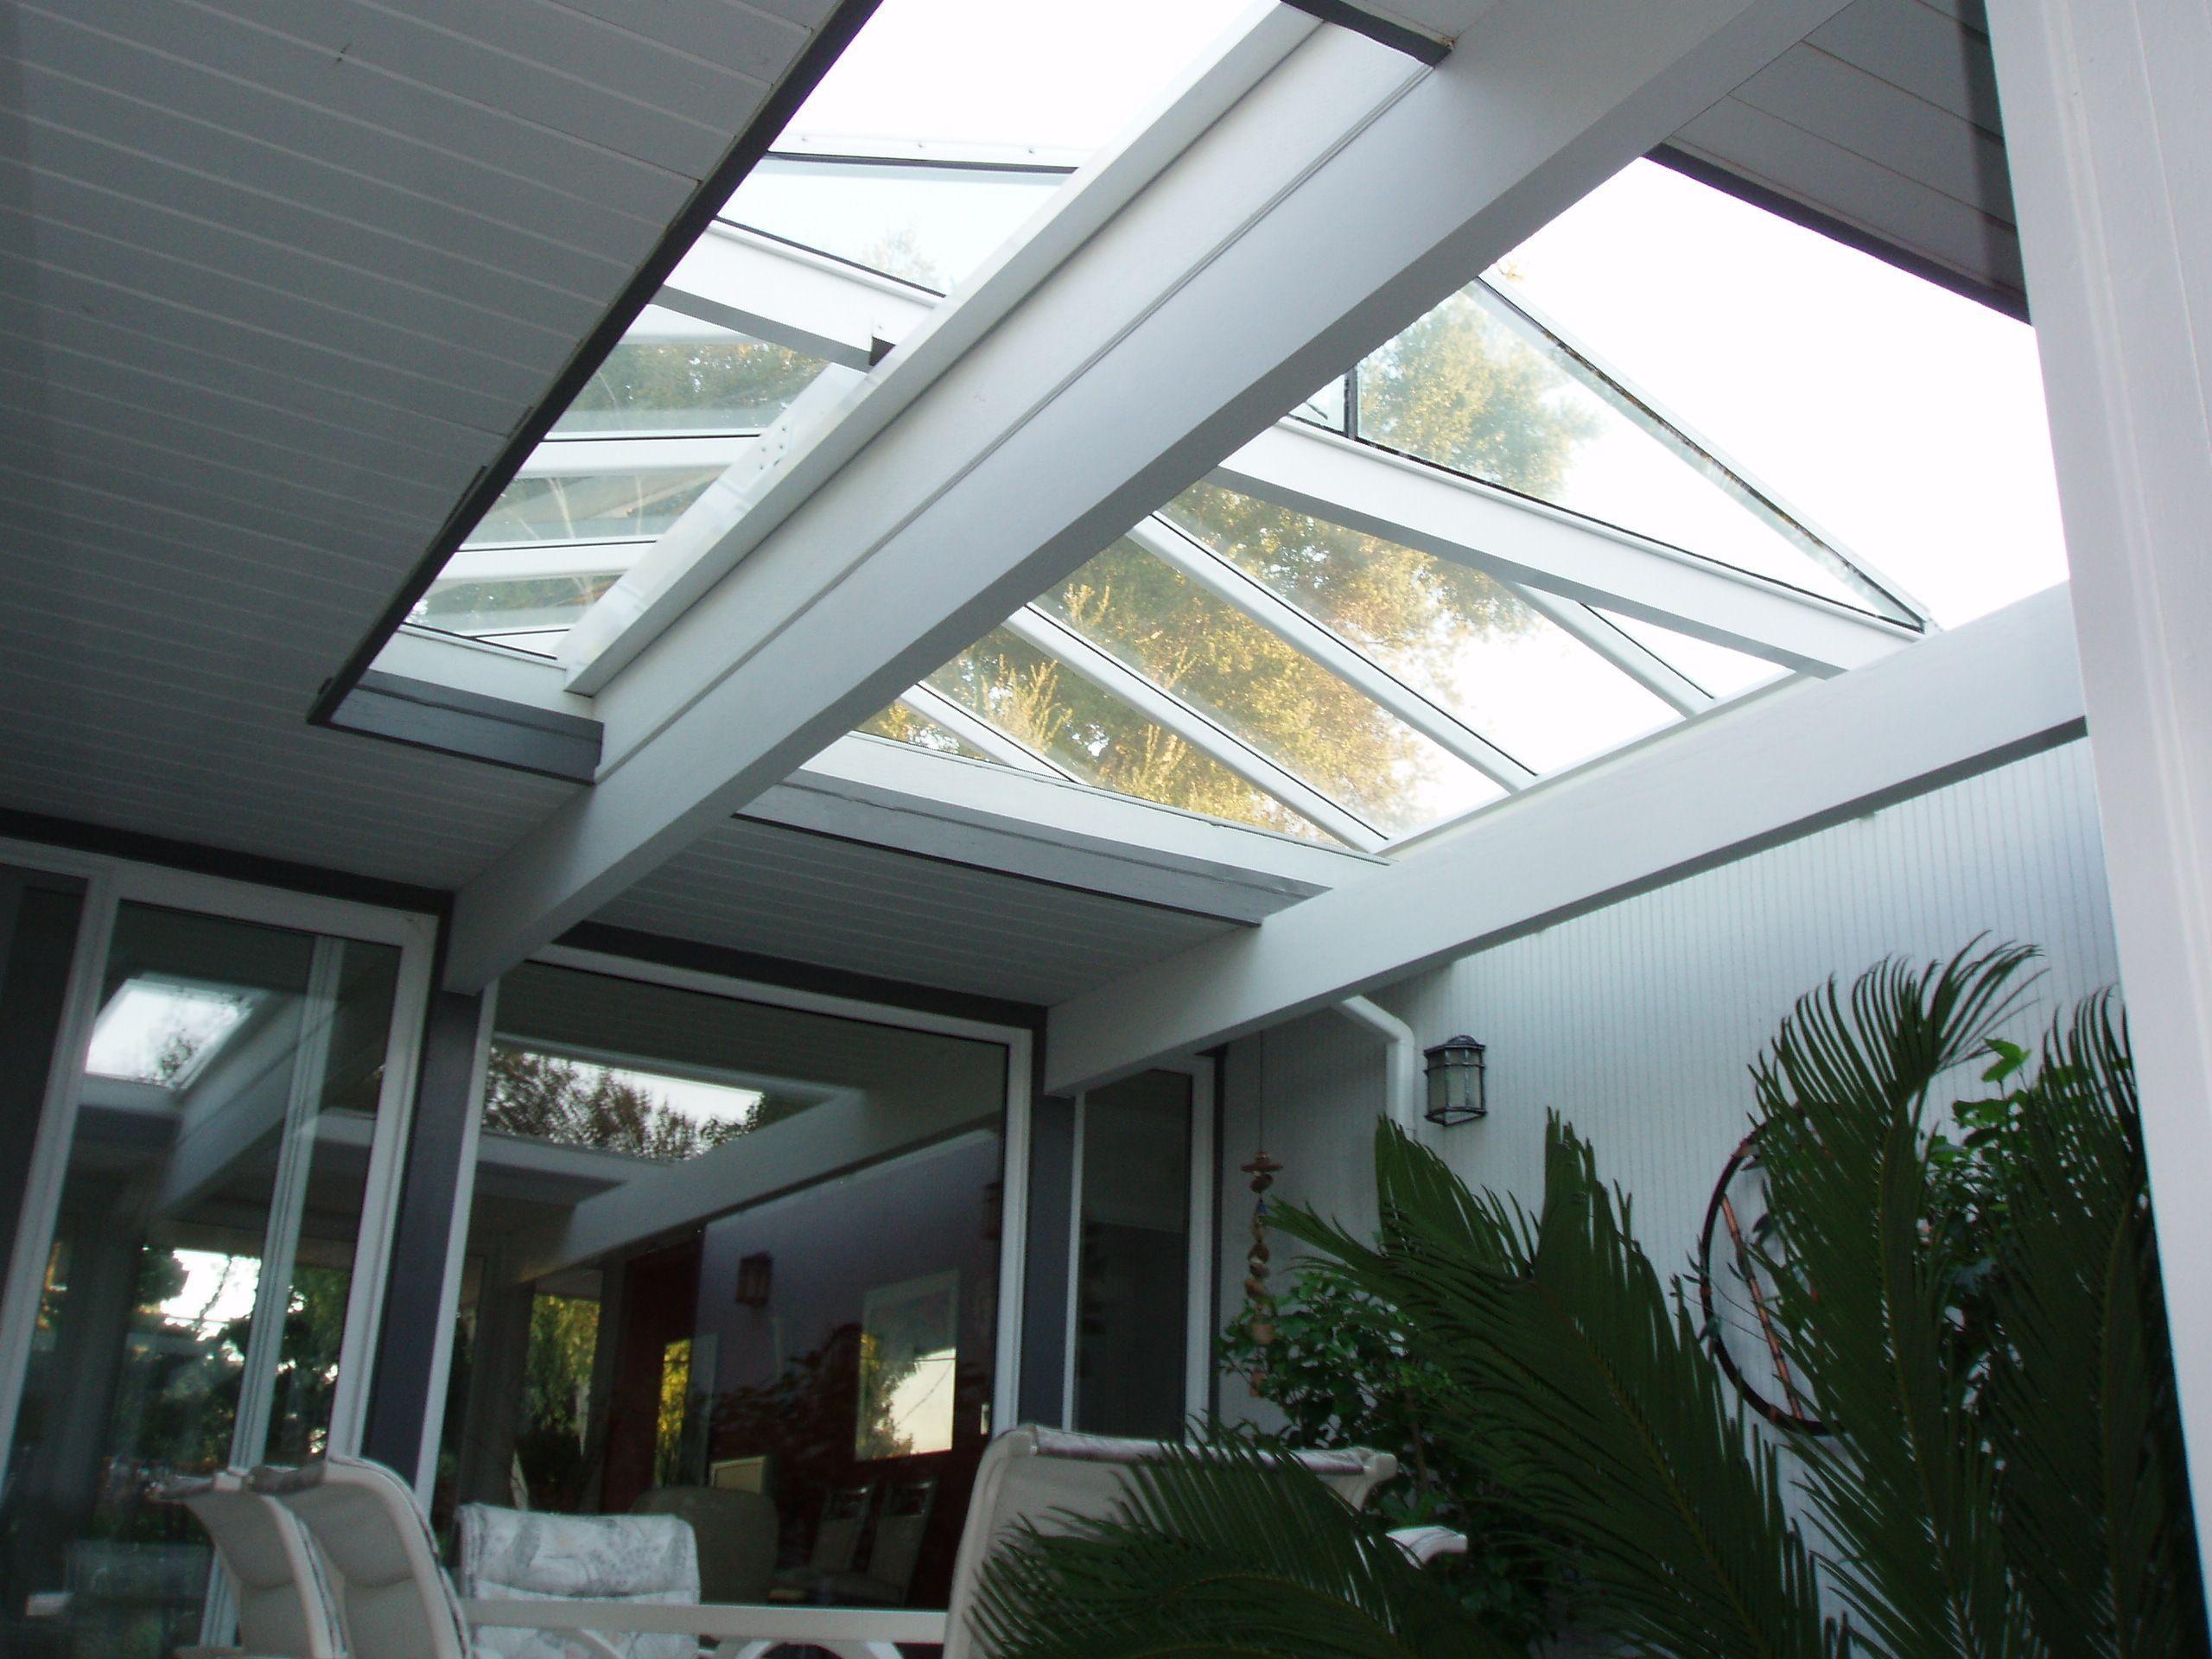 Eichler ridge roof